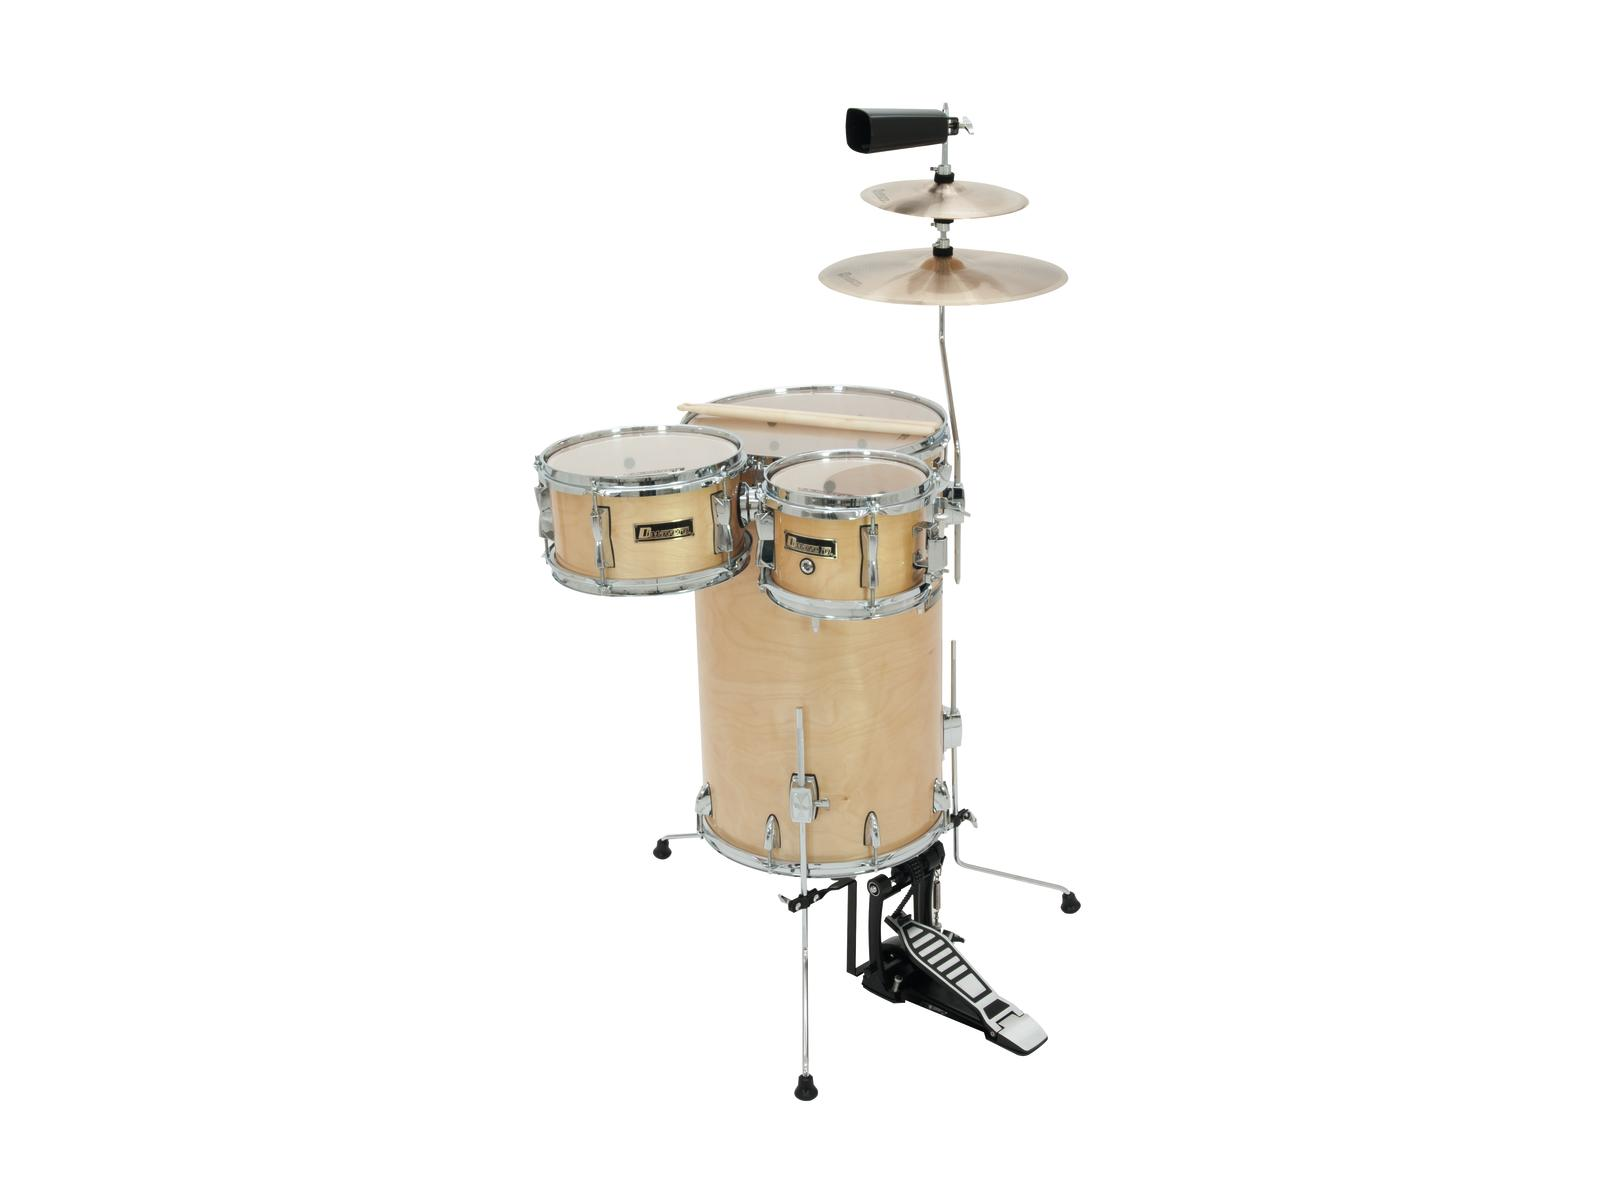 Batteria acustica, percussioni set Cocktail, 5 pezzi, acero DIMAVERY CD